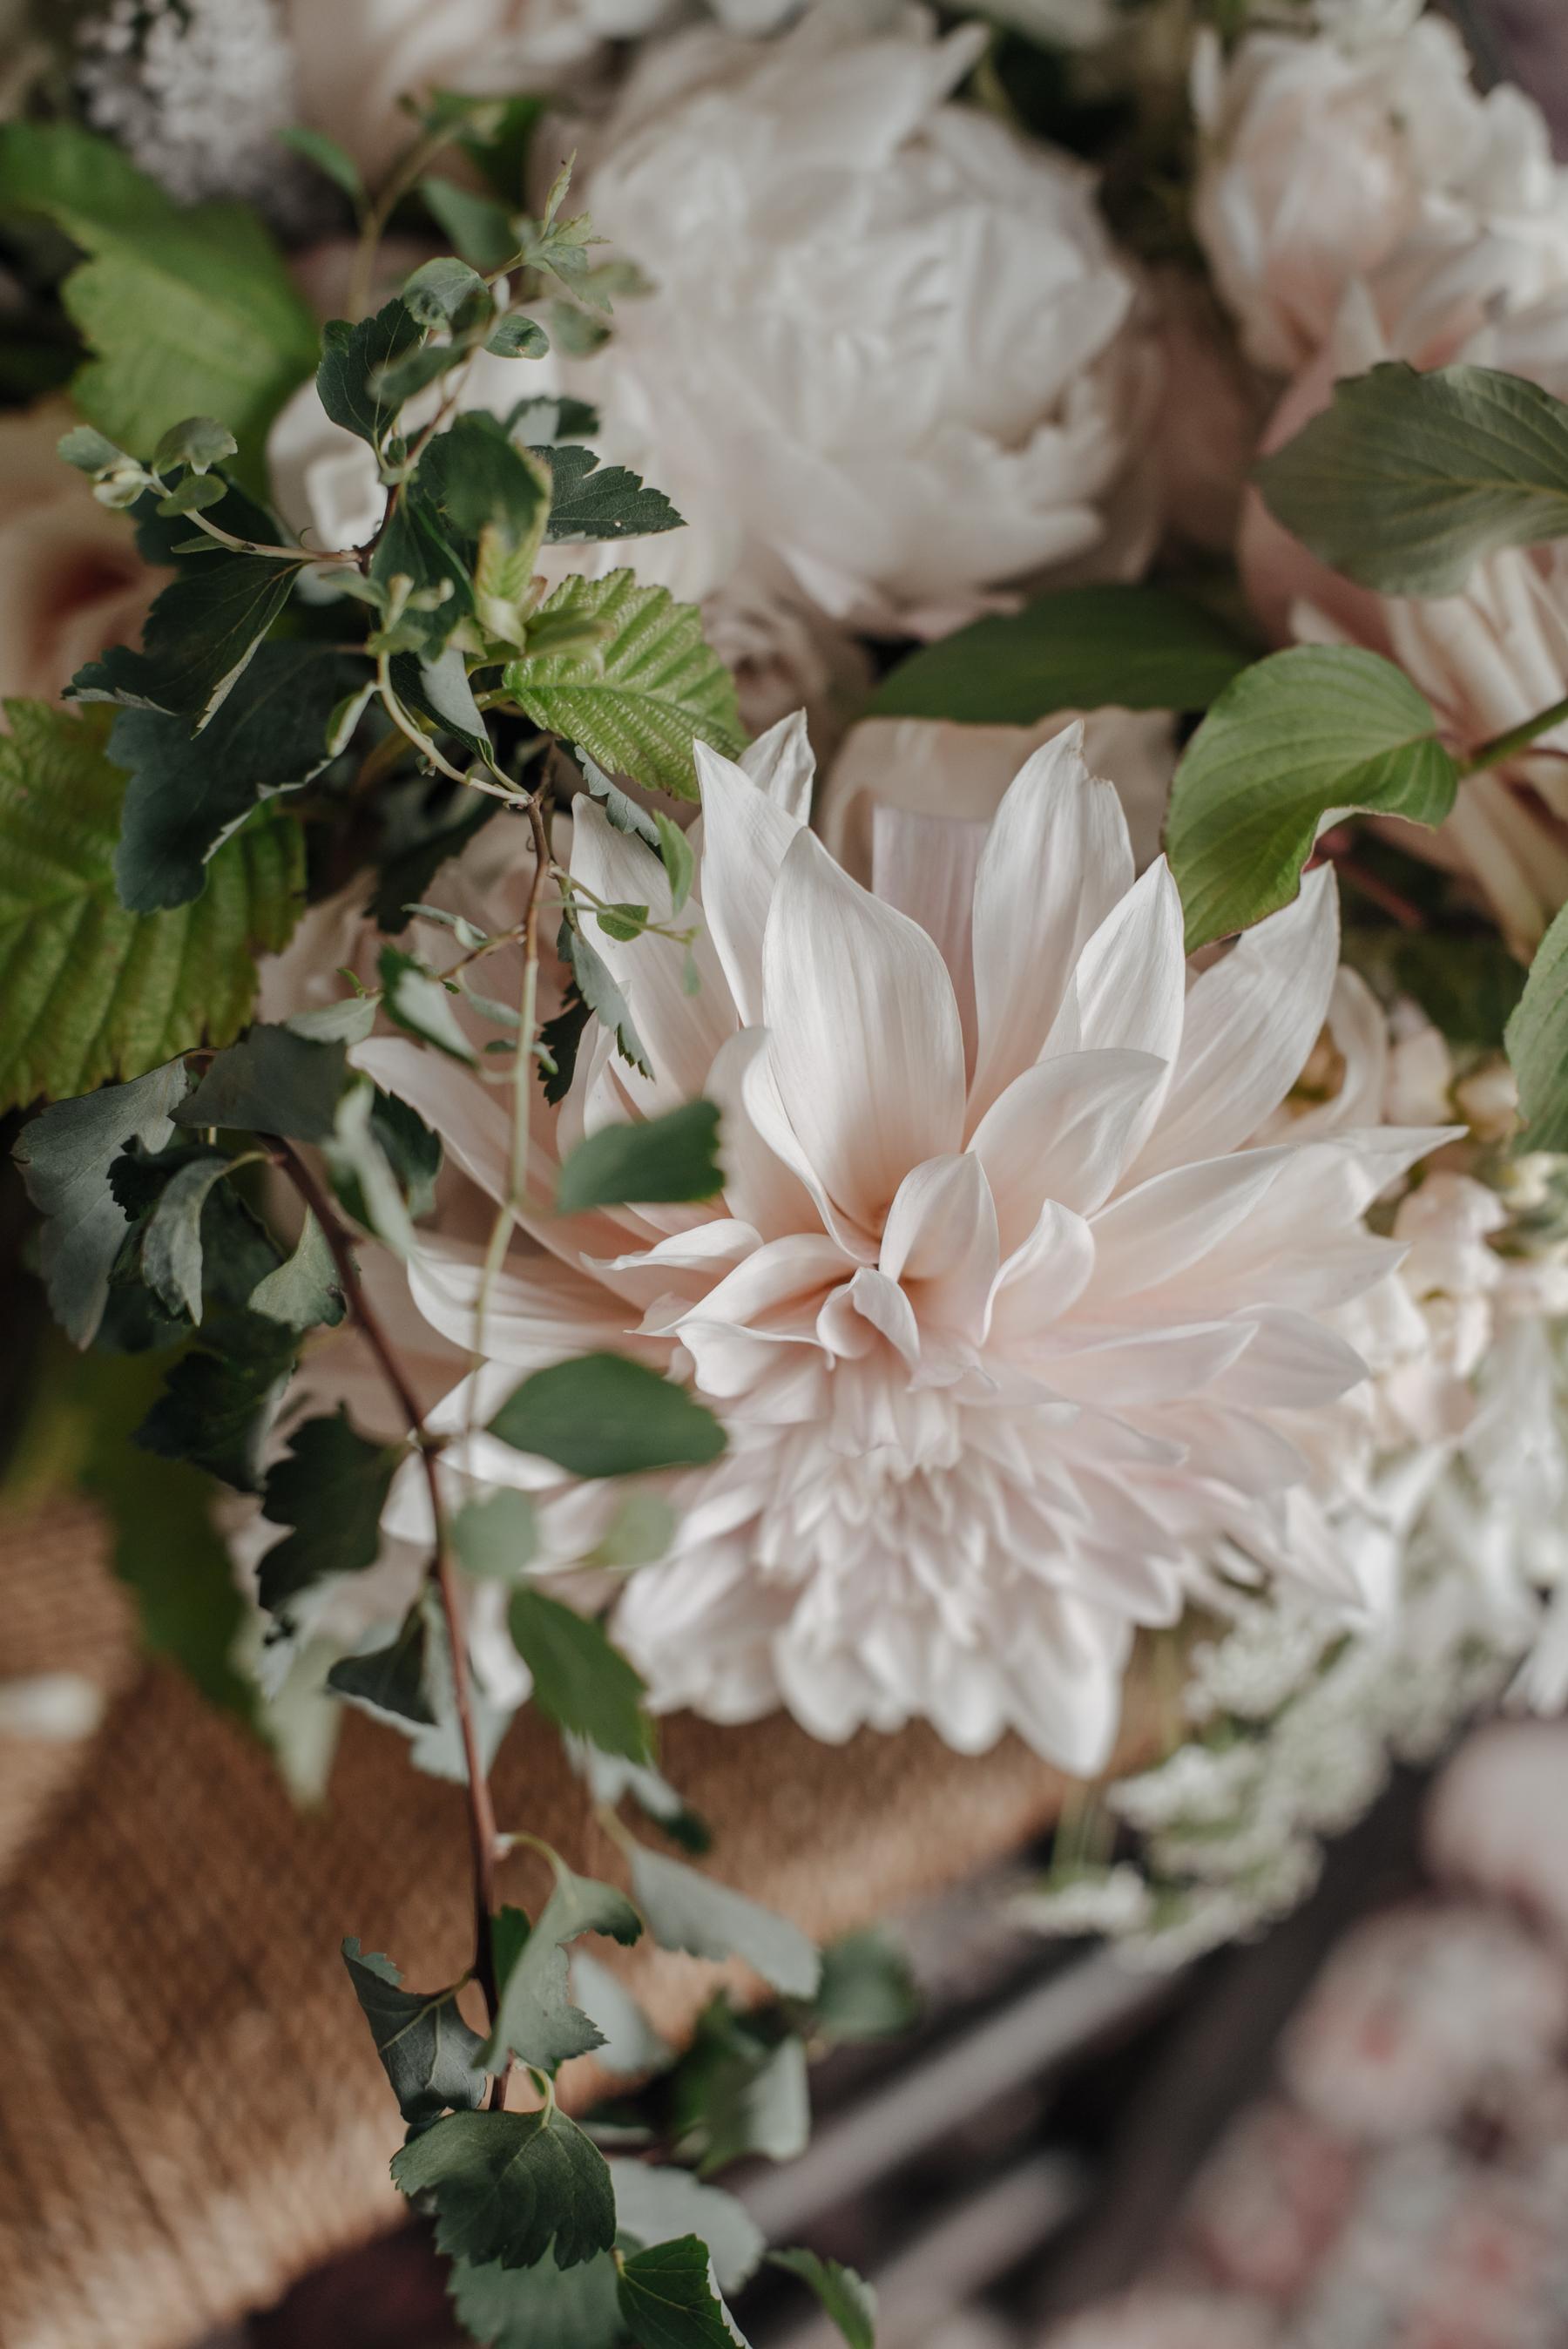 kaoverii_silva_photographer_cynthia_richard_wedding_vancouver_brix_&_mortar-4.jpg